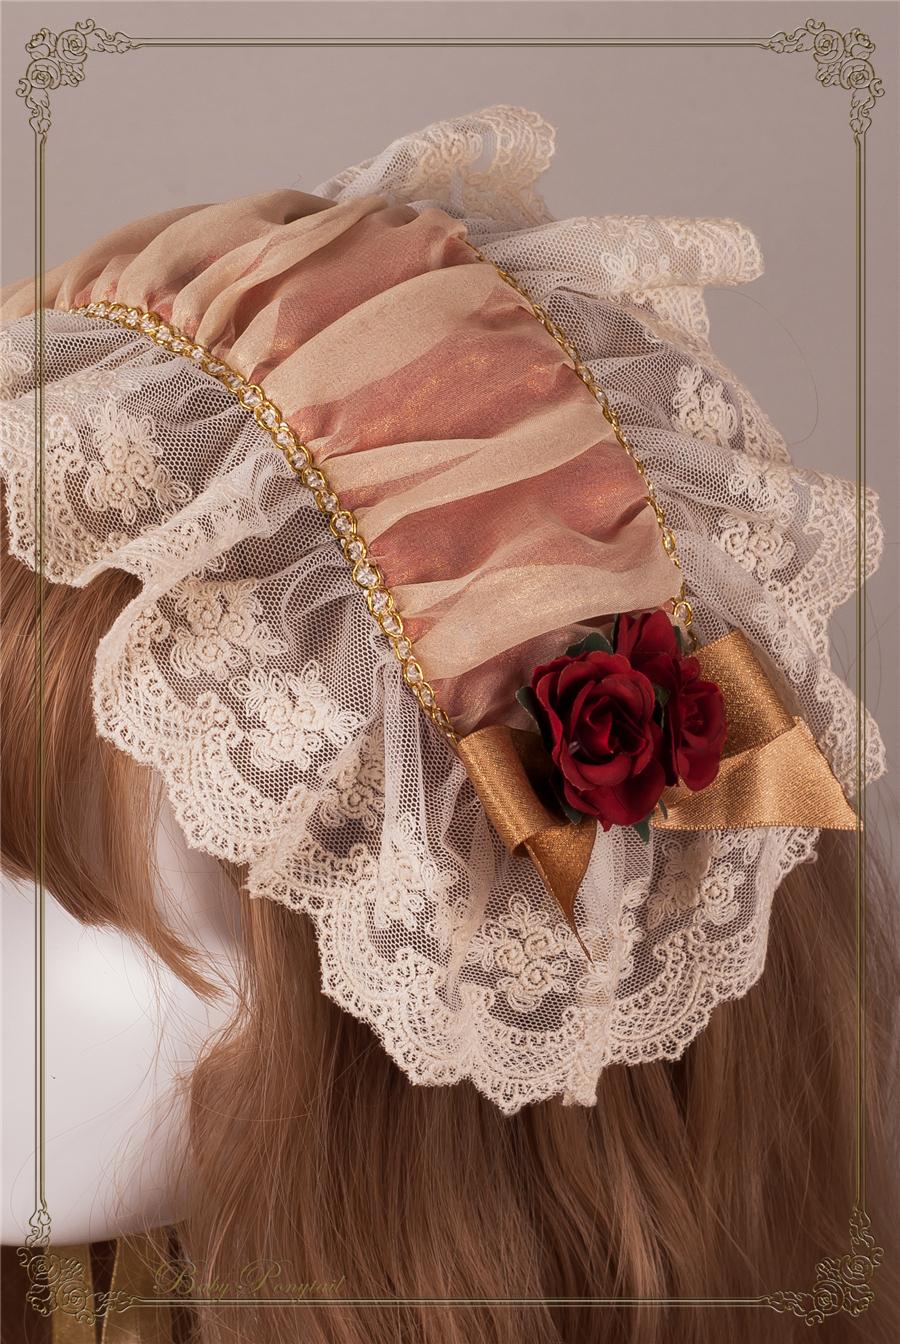 BabyPonytail_Rose Battle_Stock Photo_Petite Rose Head Dress Amber_0.jpg